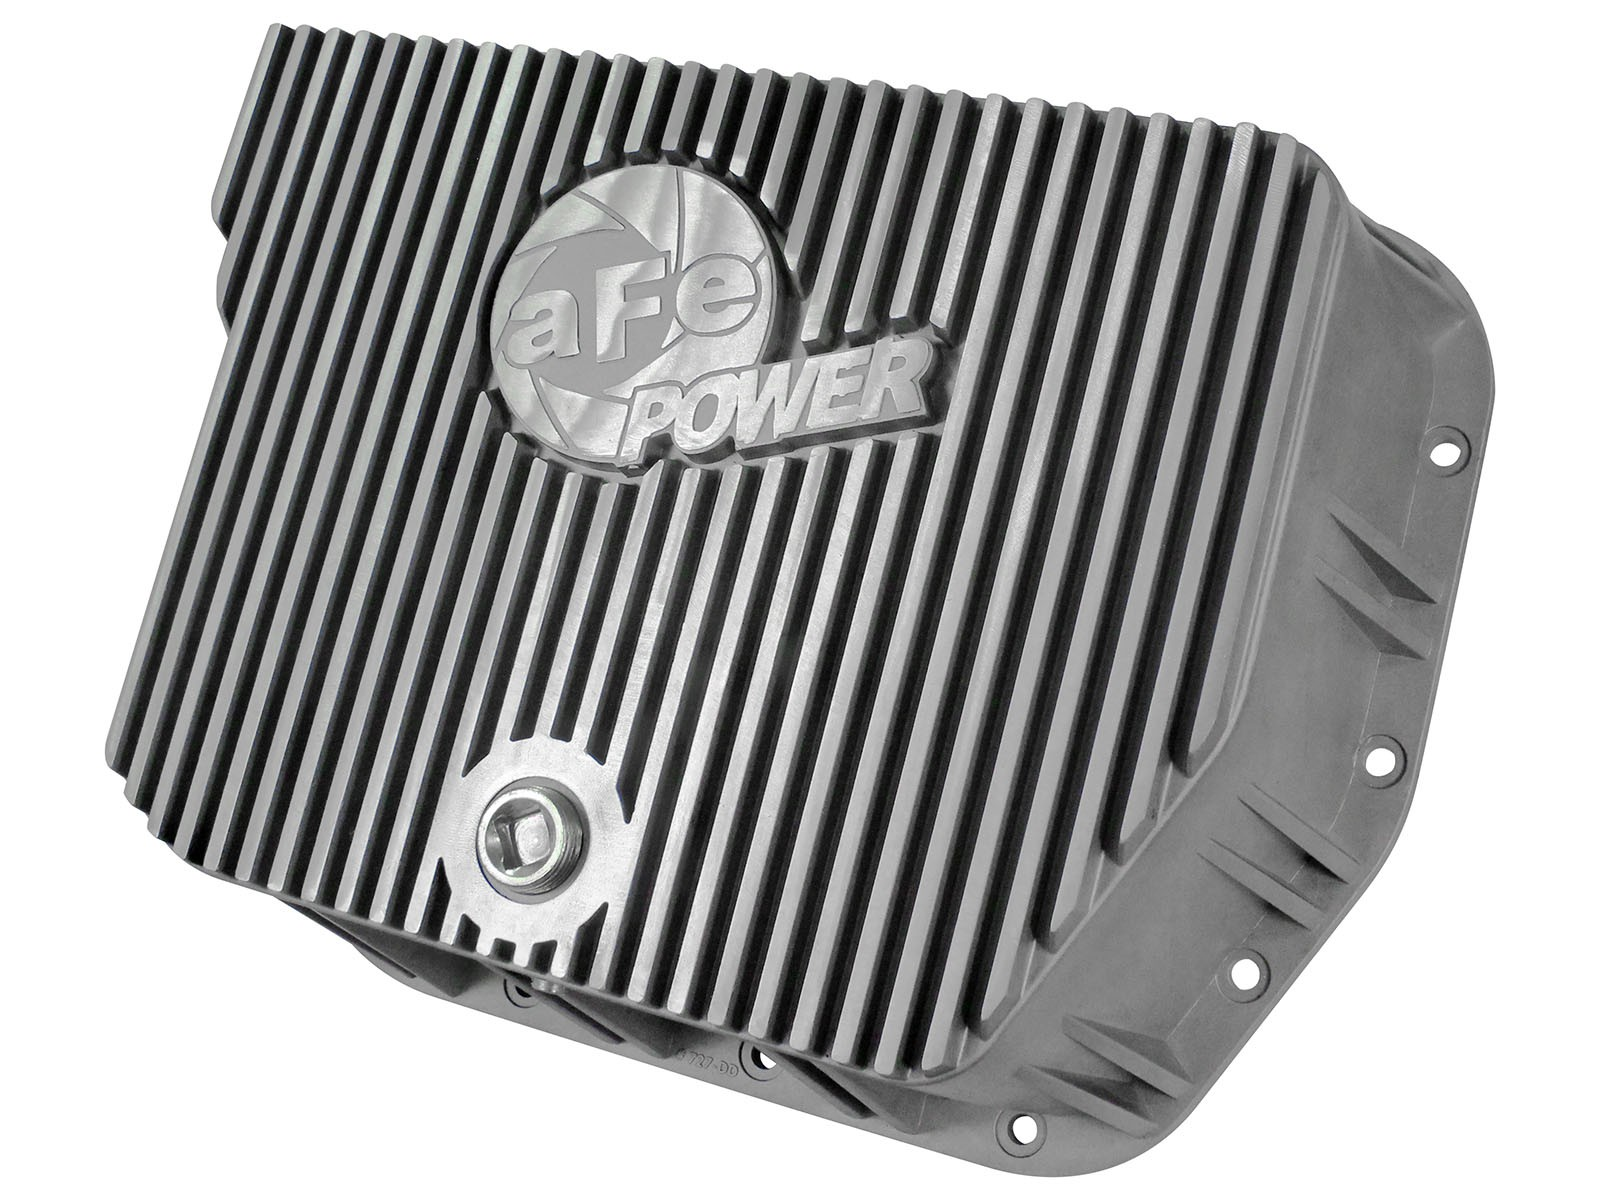 aFe POWER 46-70050 Transmission Pan, Machined Fins